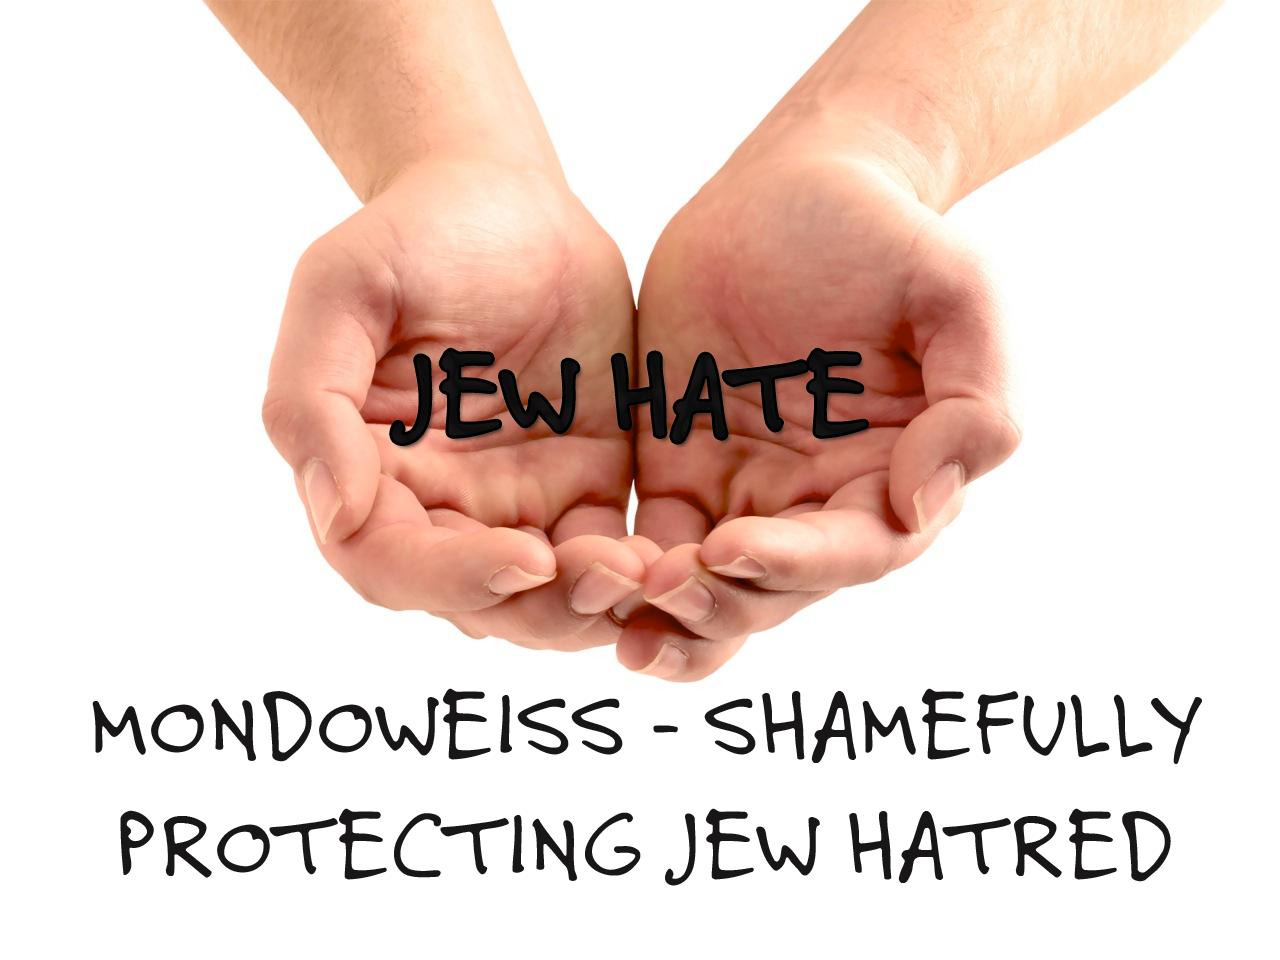 Mondoweiss protecting Jew hate